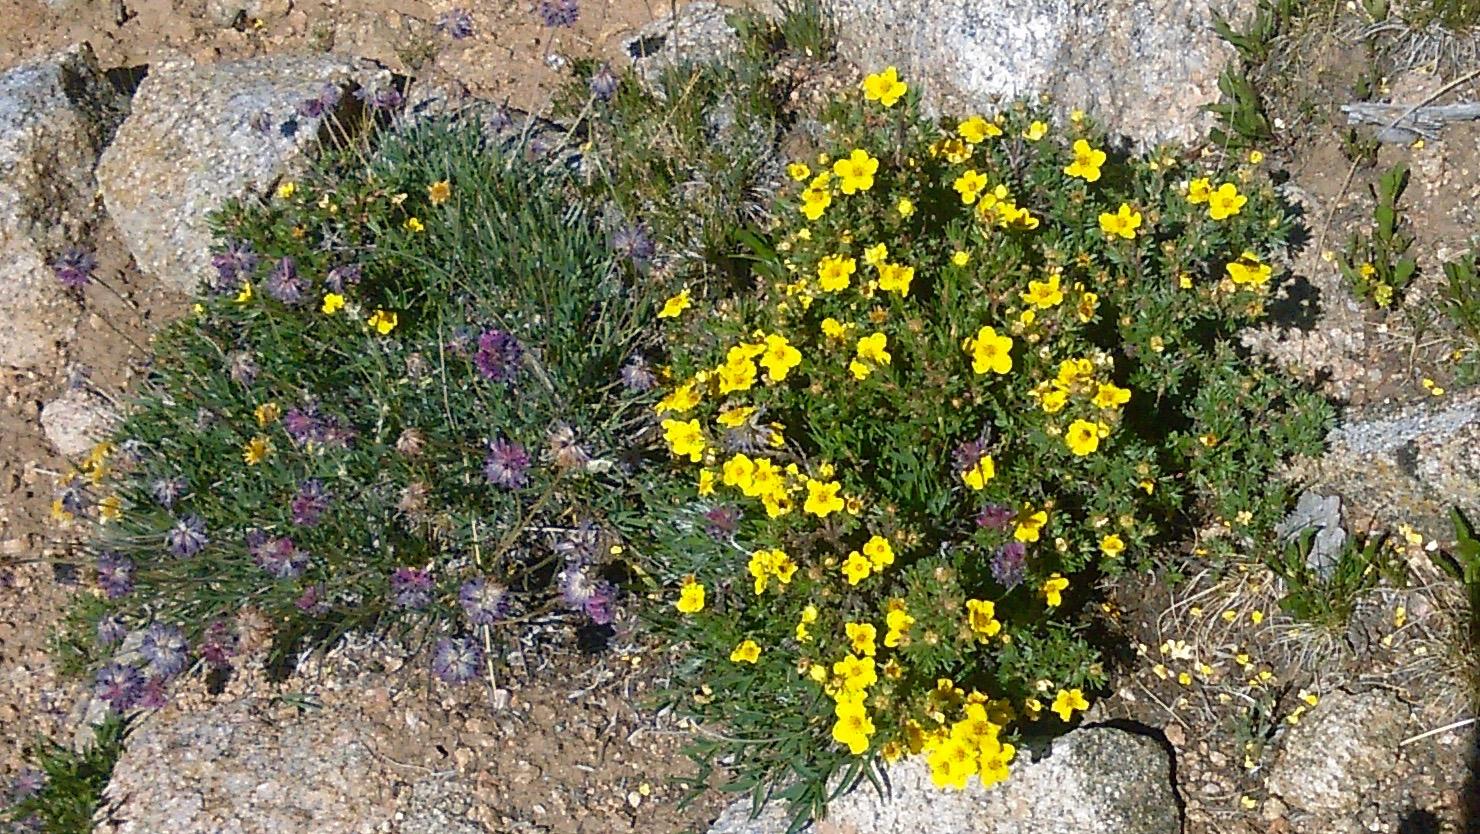 07 High altitude flower show